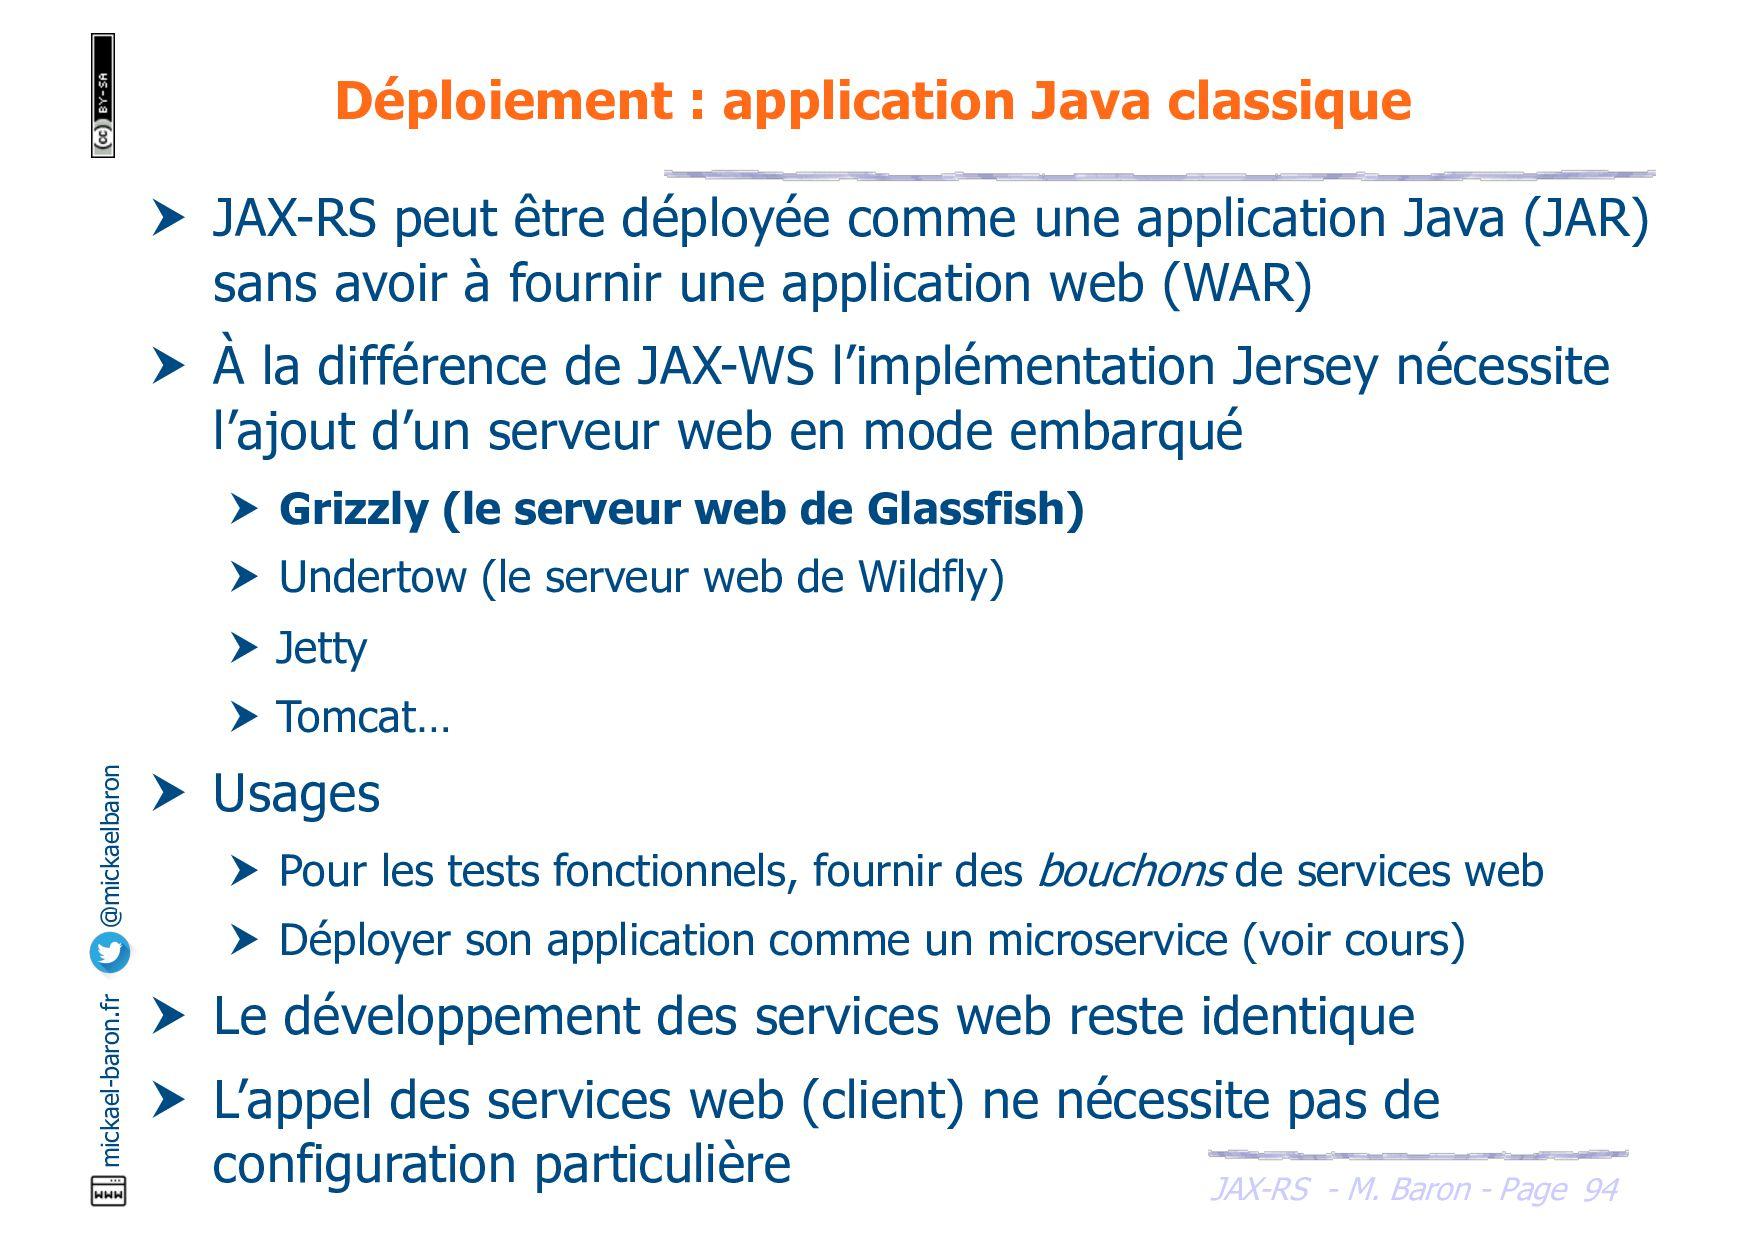 JAX-RS - M. Baron - Page mickael-baron.fr @mick...